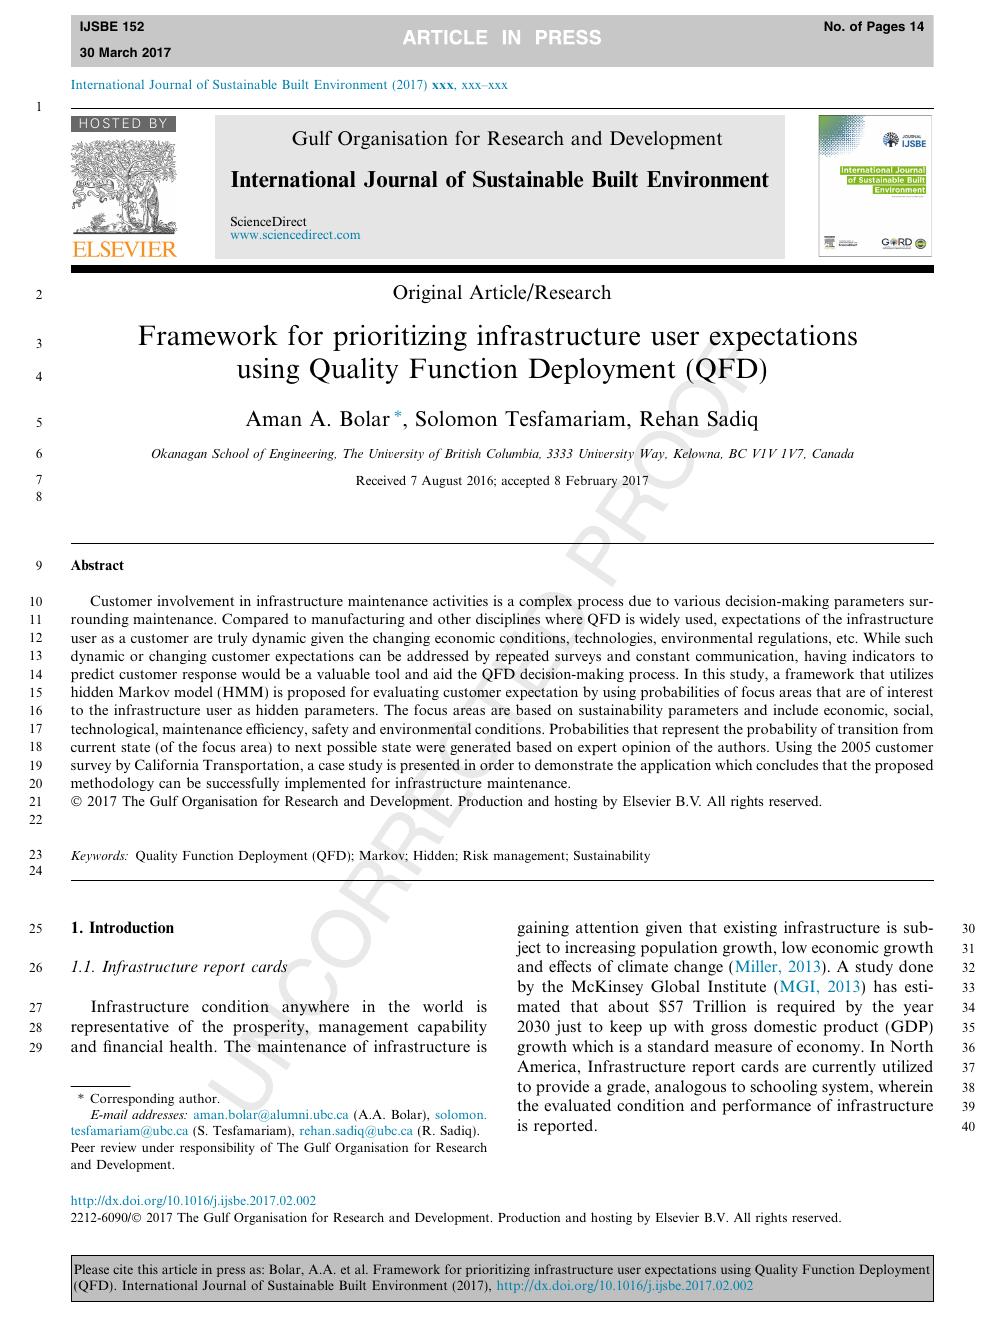 Framework for prioritizing infrastructure user expectations using